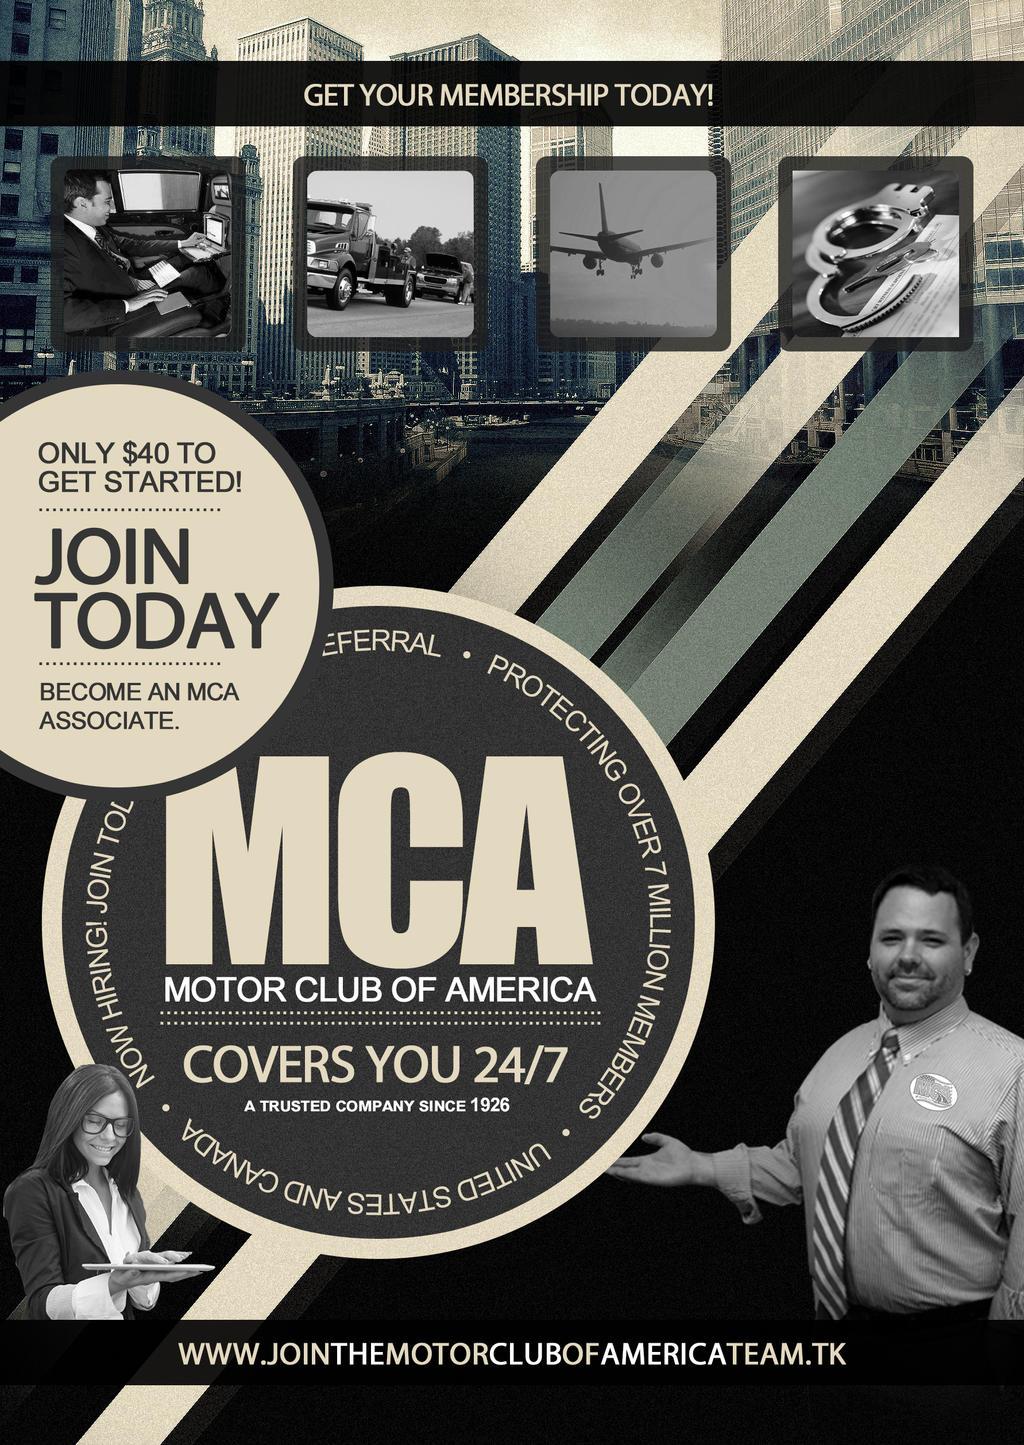 Membership plans motor club of america by grabmca on for Road america motor club